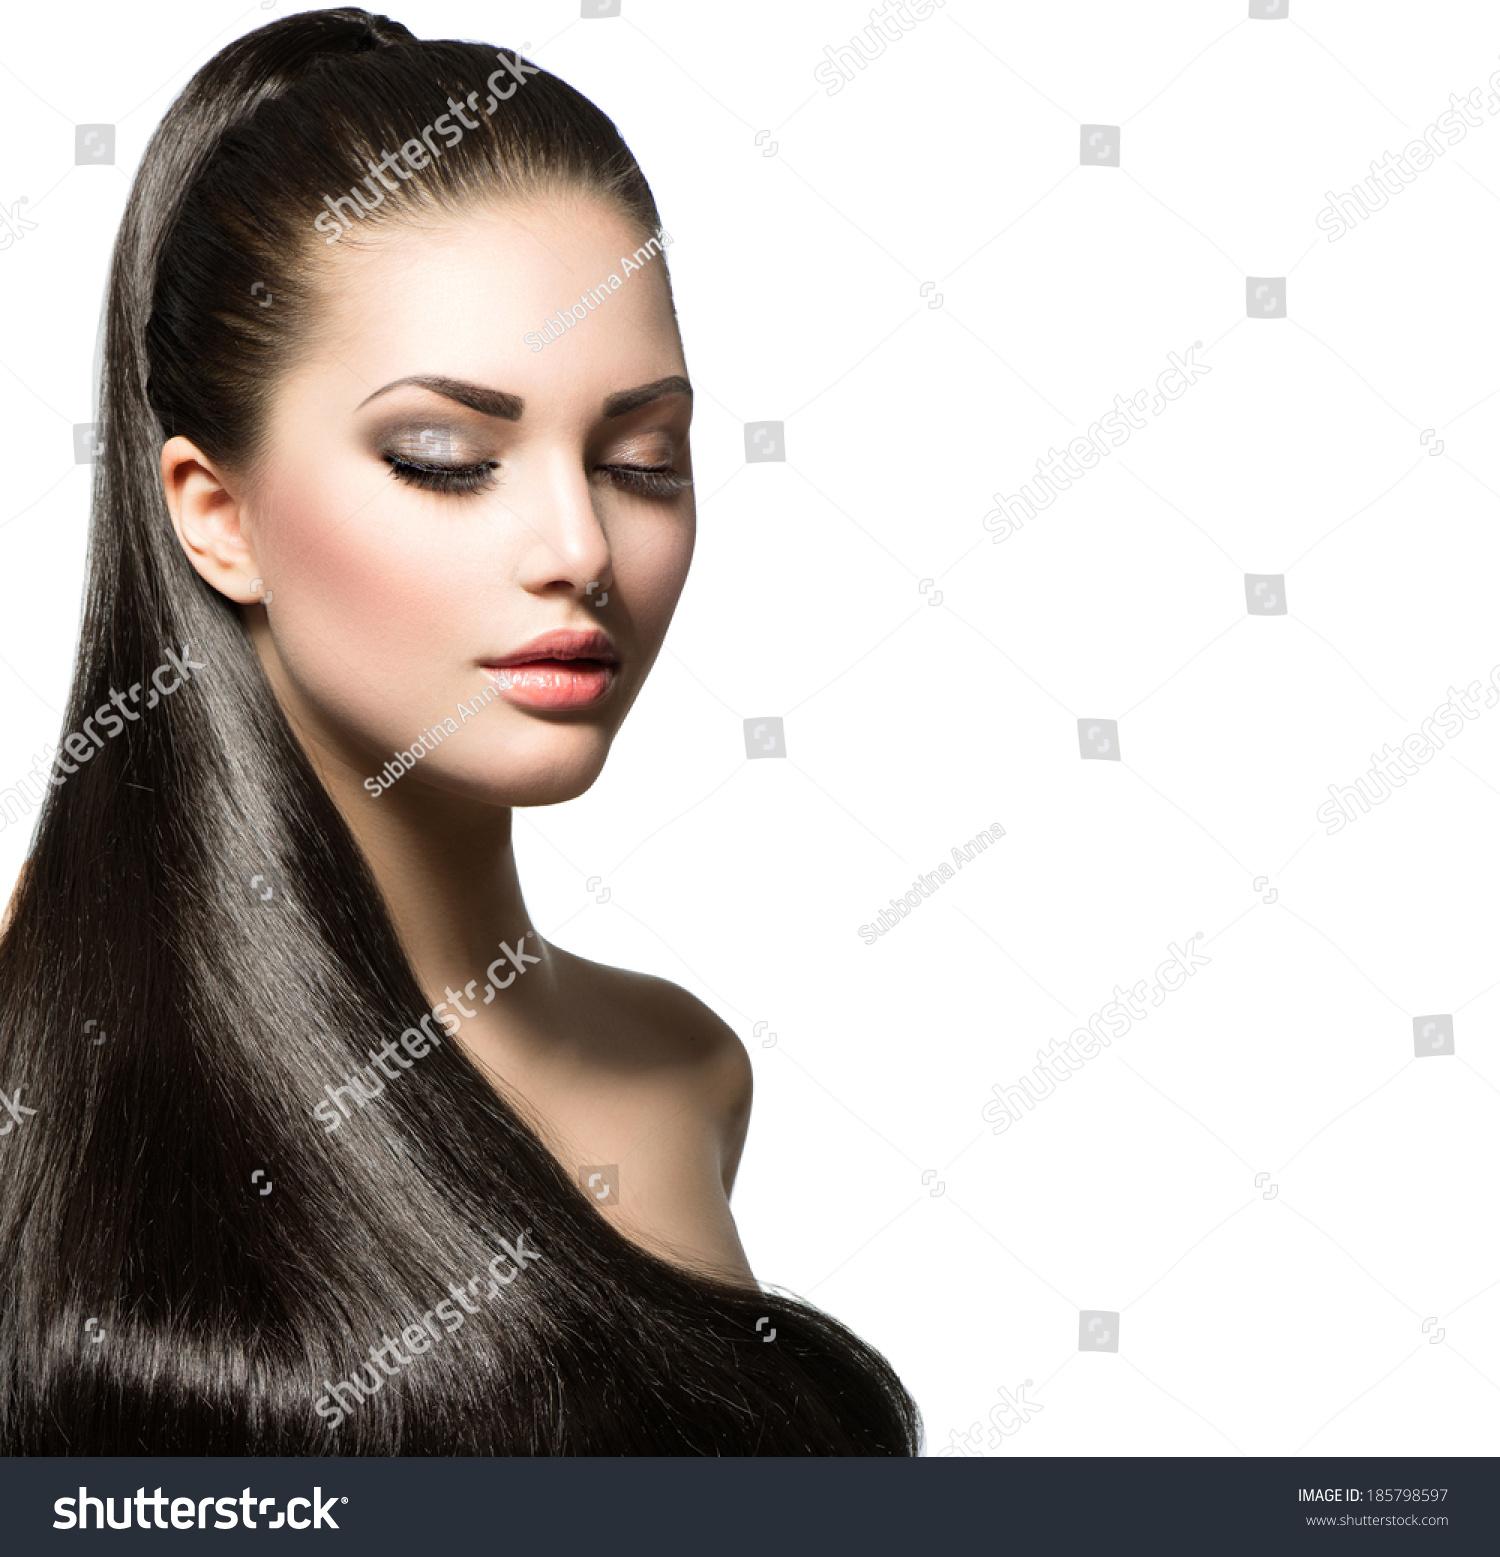 hair stock photos - photo #23